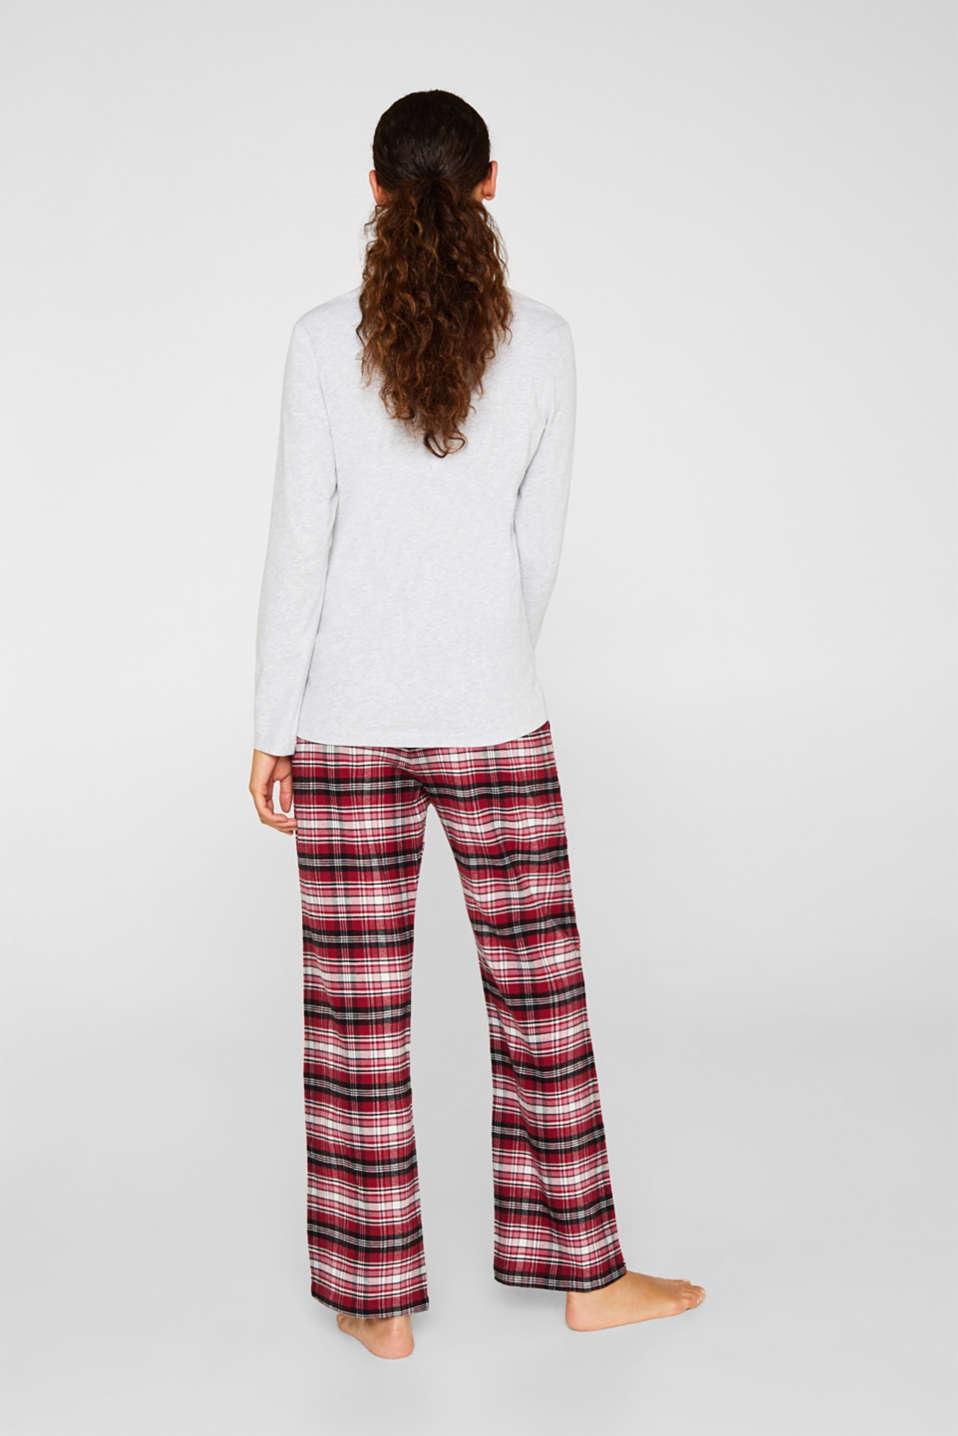 Jersey/flannel pyjamas, 100% cotton, DARK RED, detail image number 2